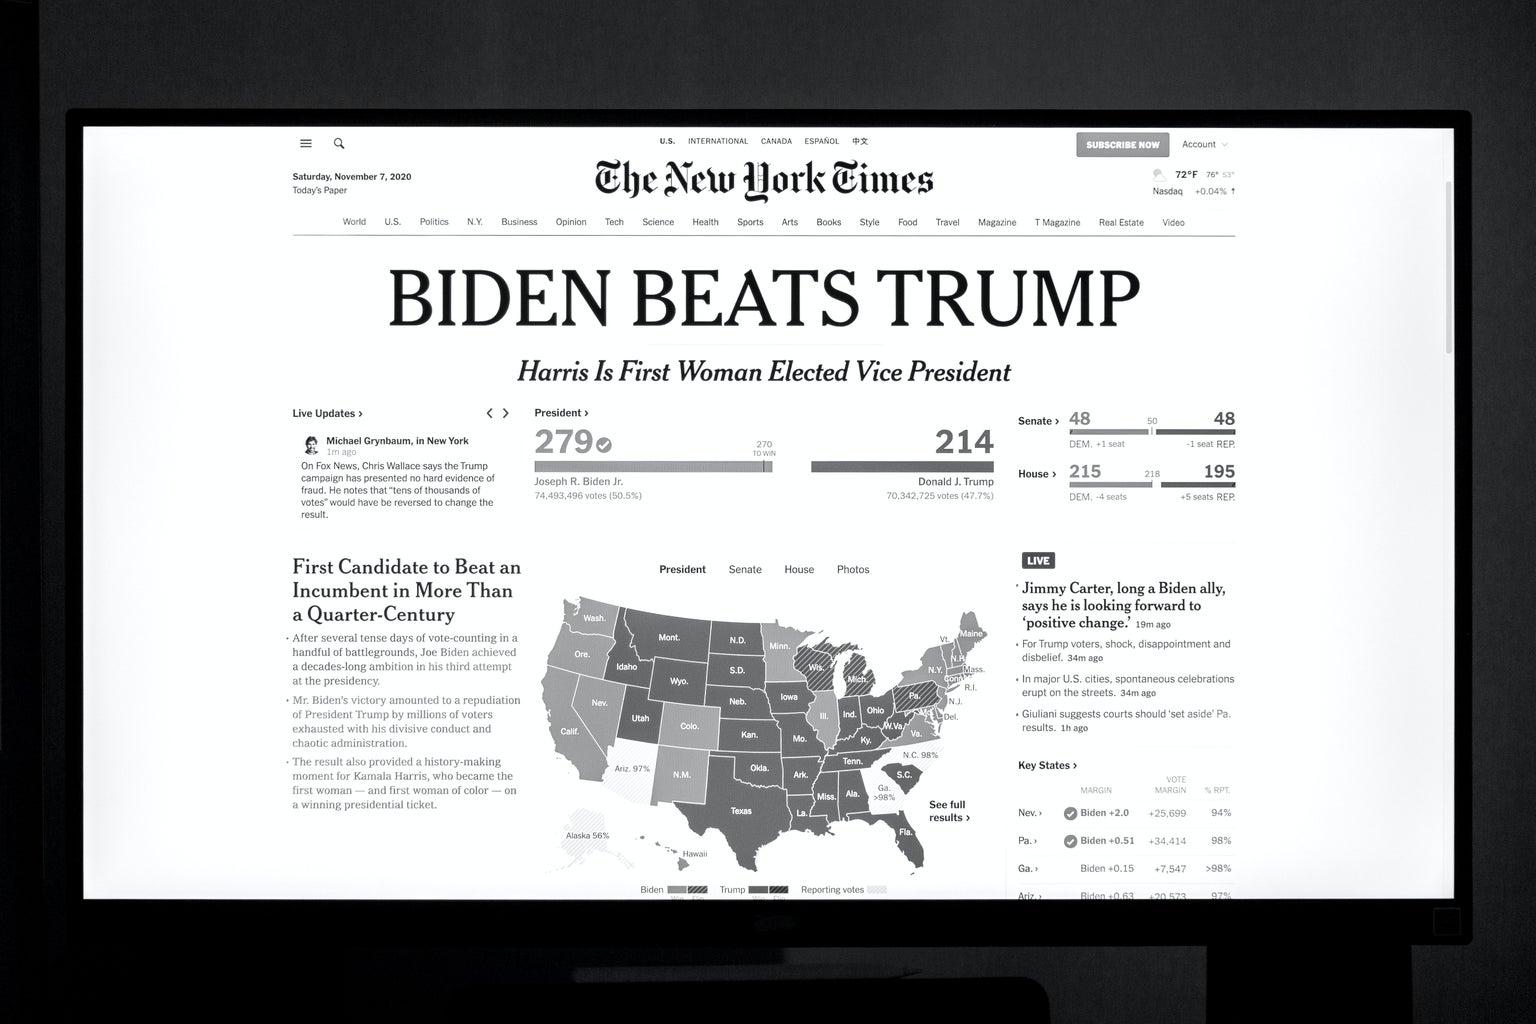 newspaper cover announcing Biden's win